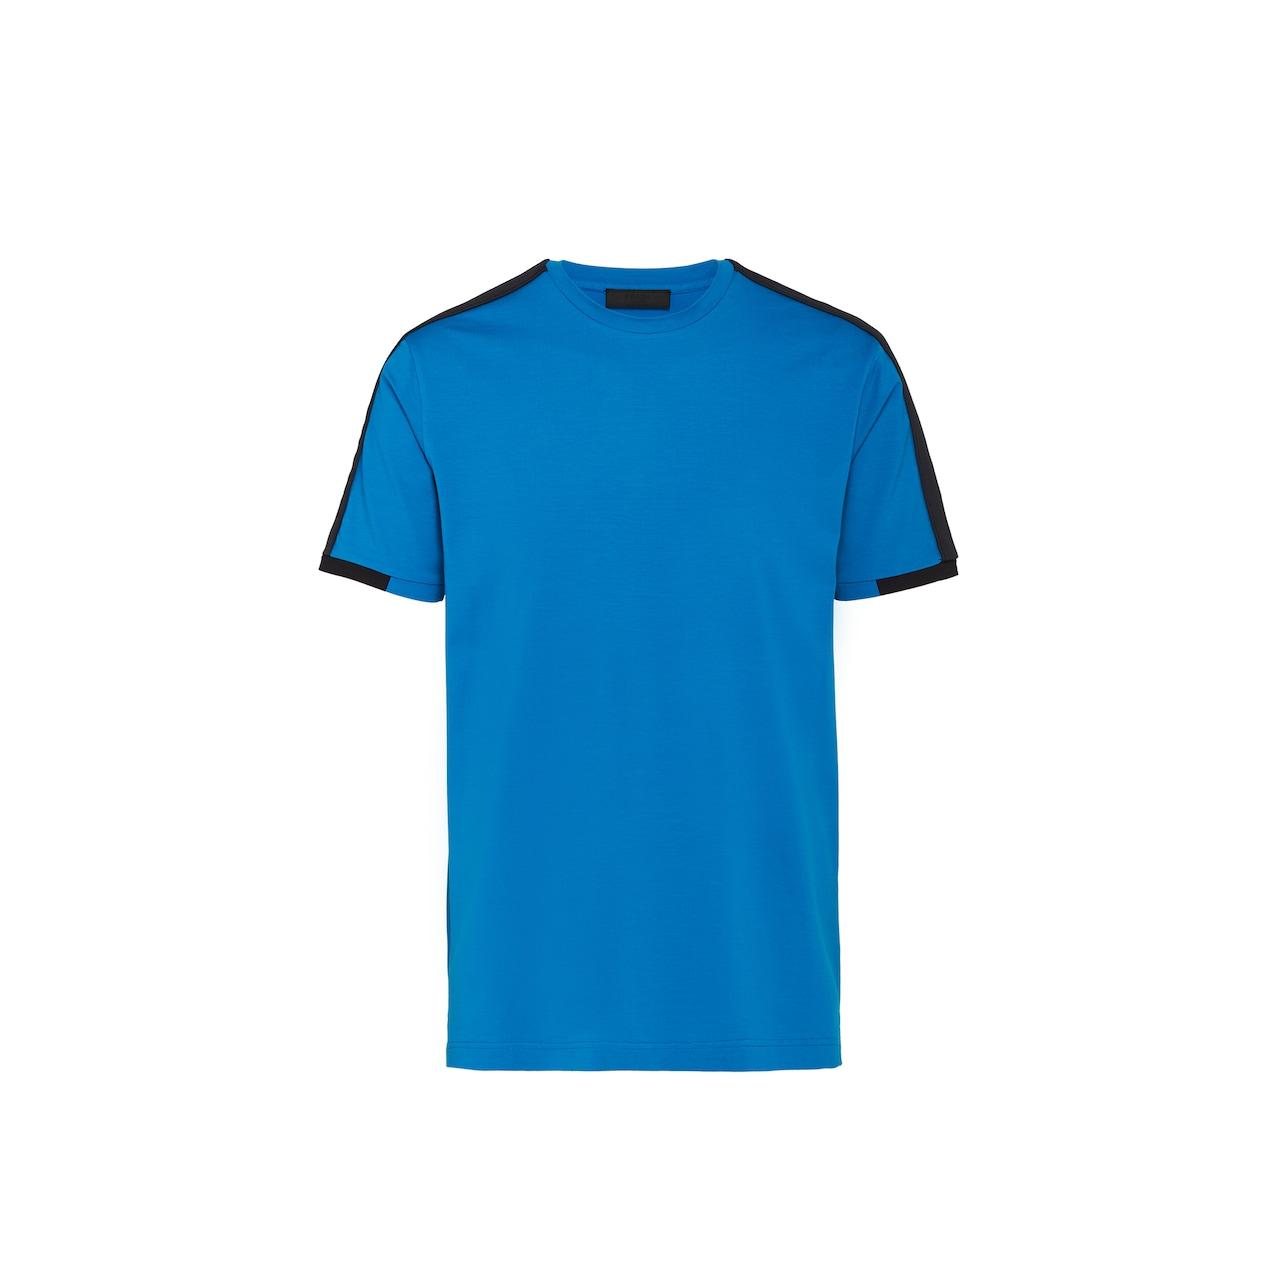 Prada 针织嵌饰T恤 1